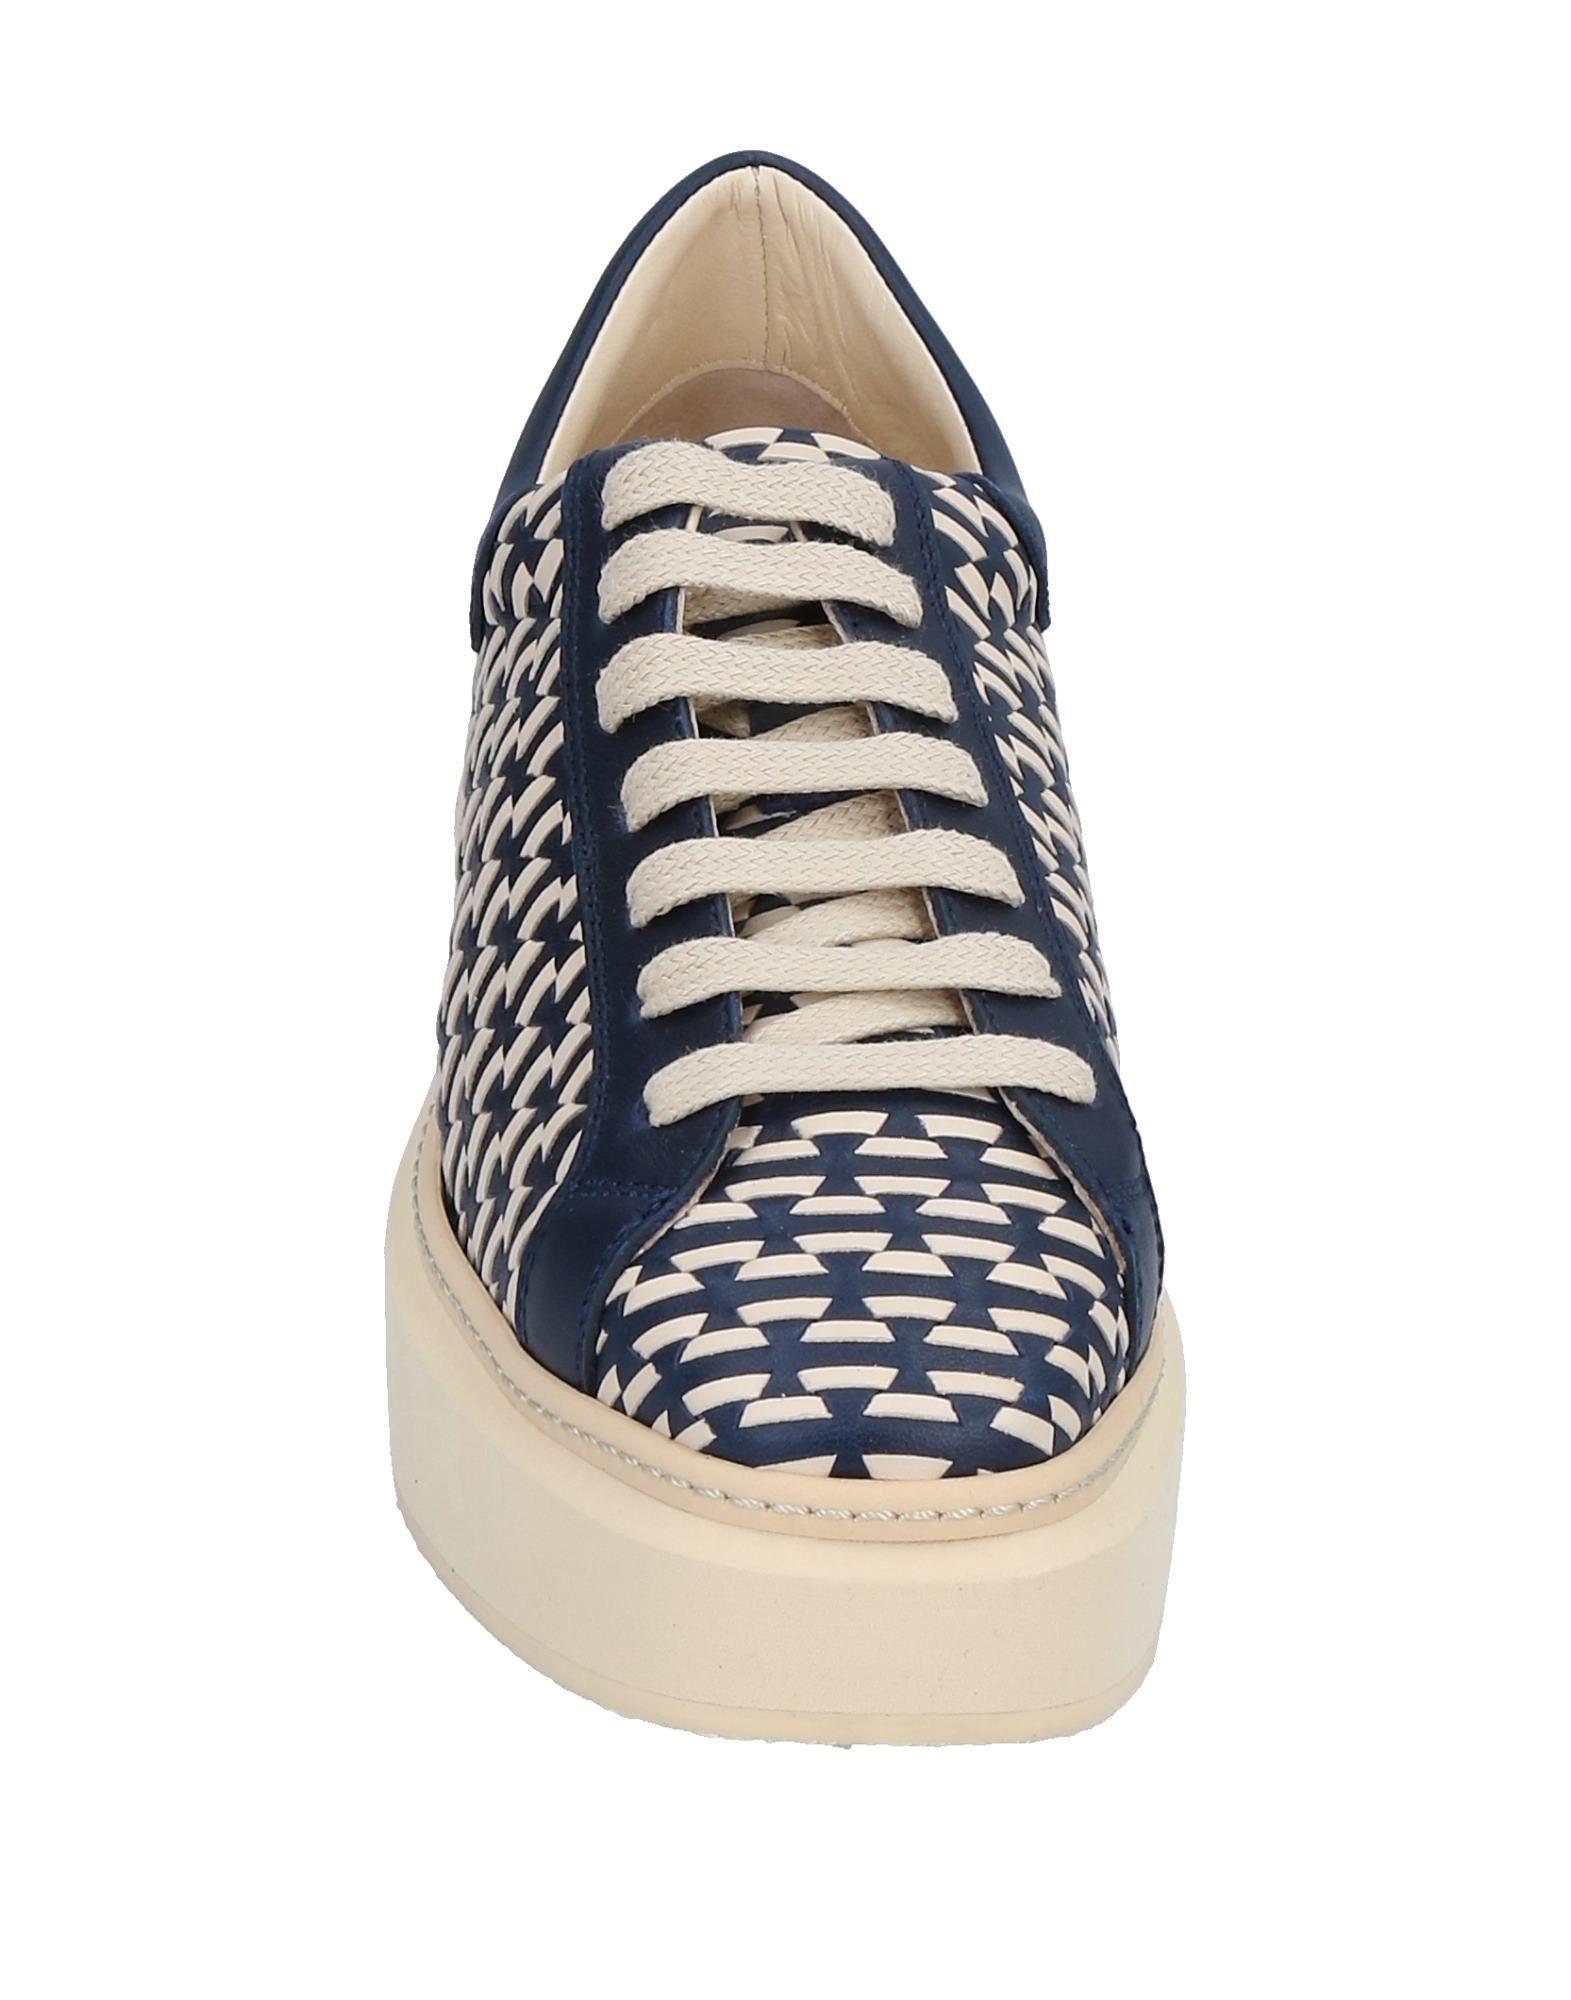 Manuel Barceló Sneakers Damen  11534837CW 11534837CW 11534837CW Neue Schuhe 0f0843